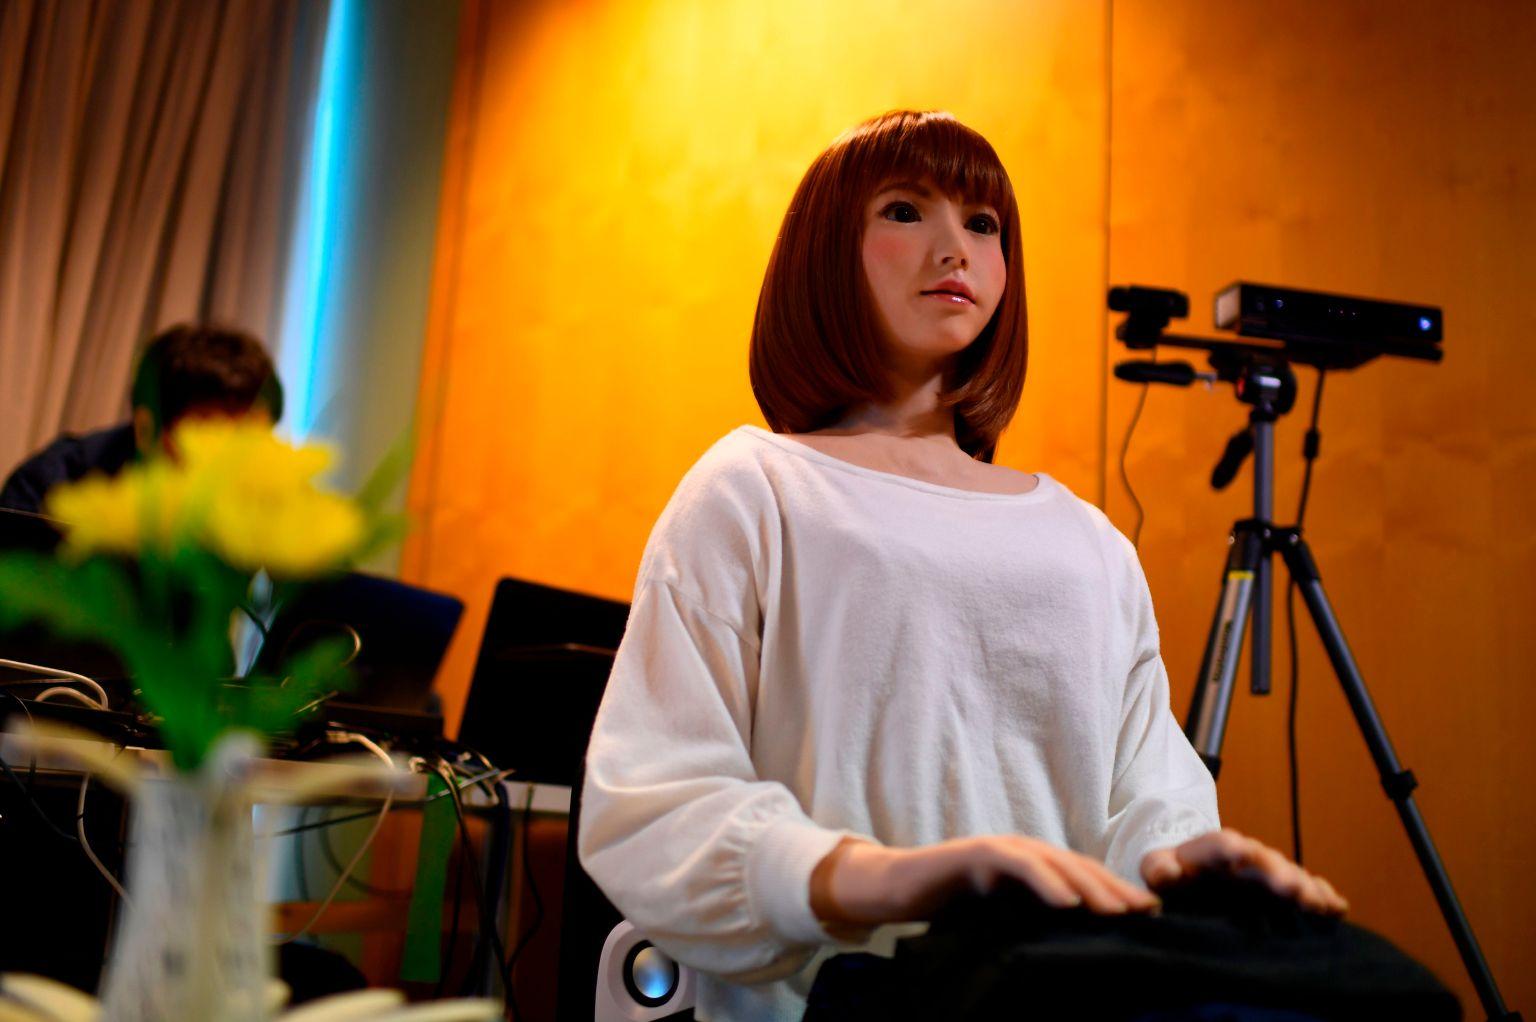 Erica, un robot controlado por Inteligencia Artificial, protagonizará un nuevo filme sci-fi